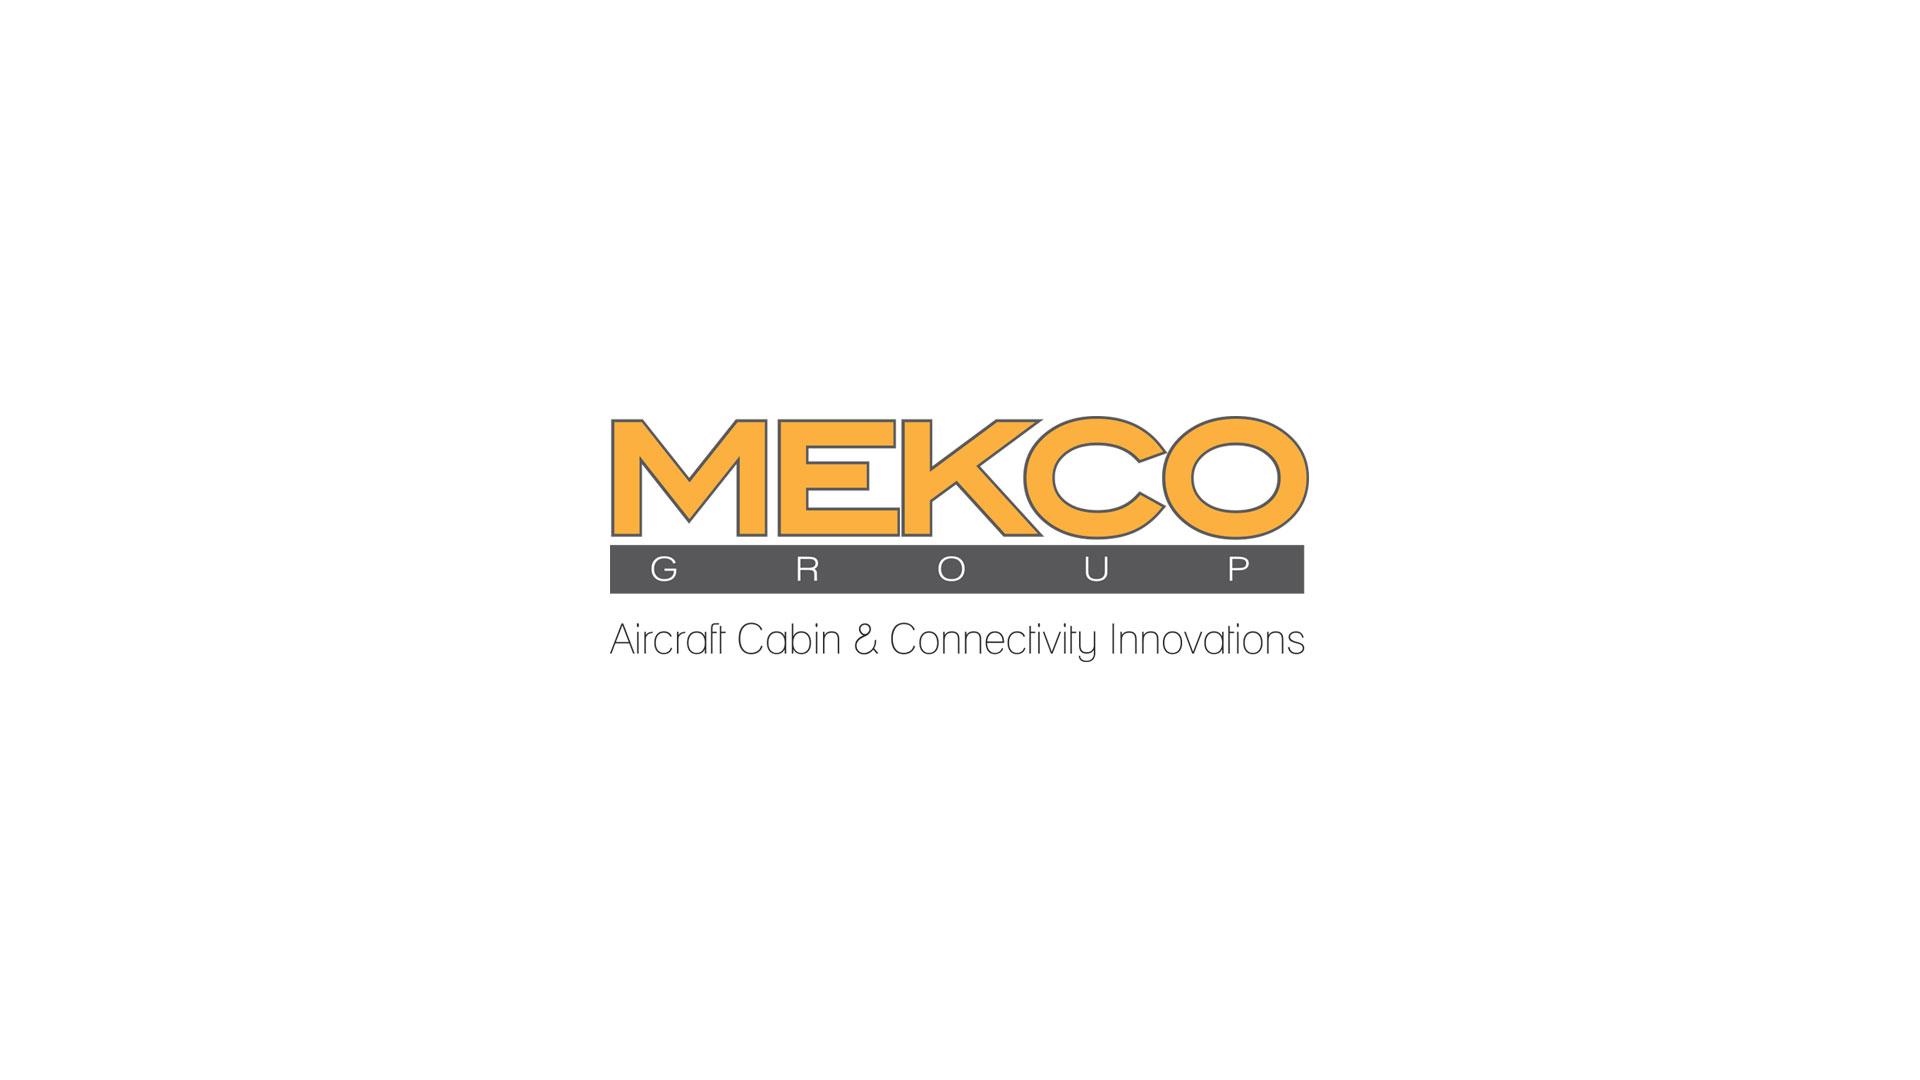 Mekco Group